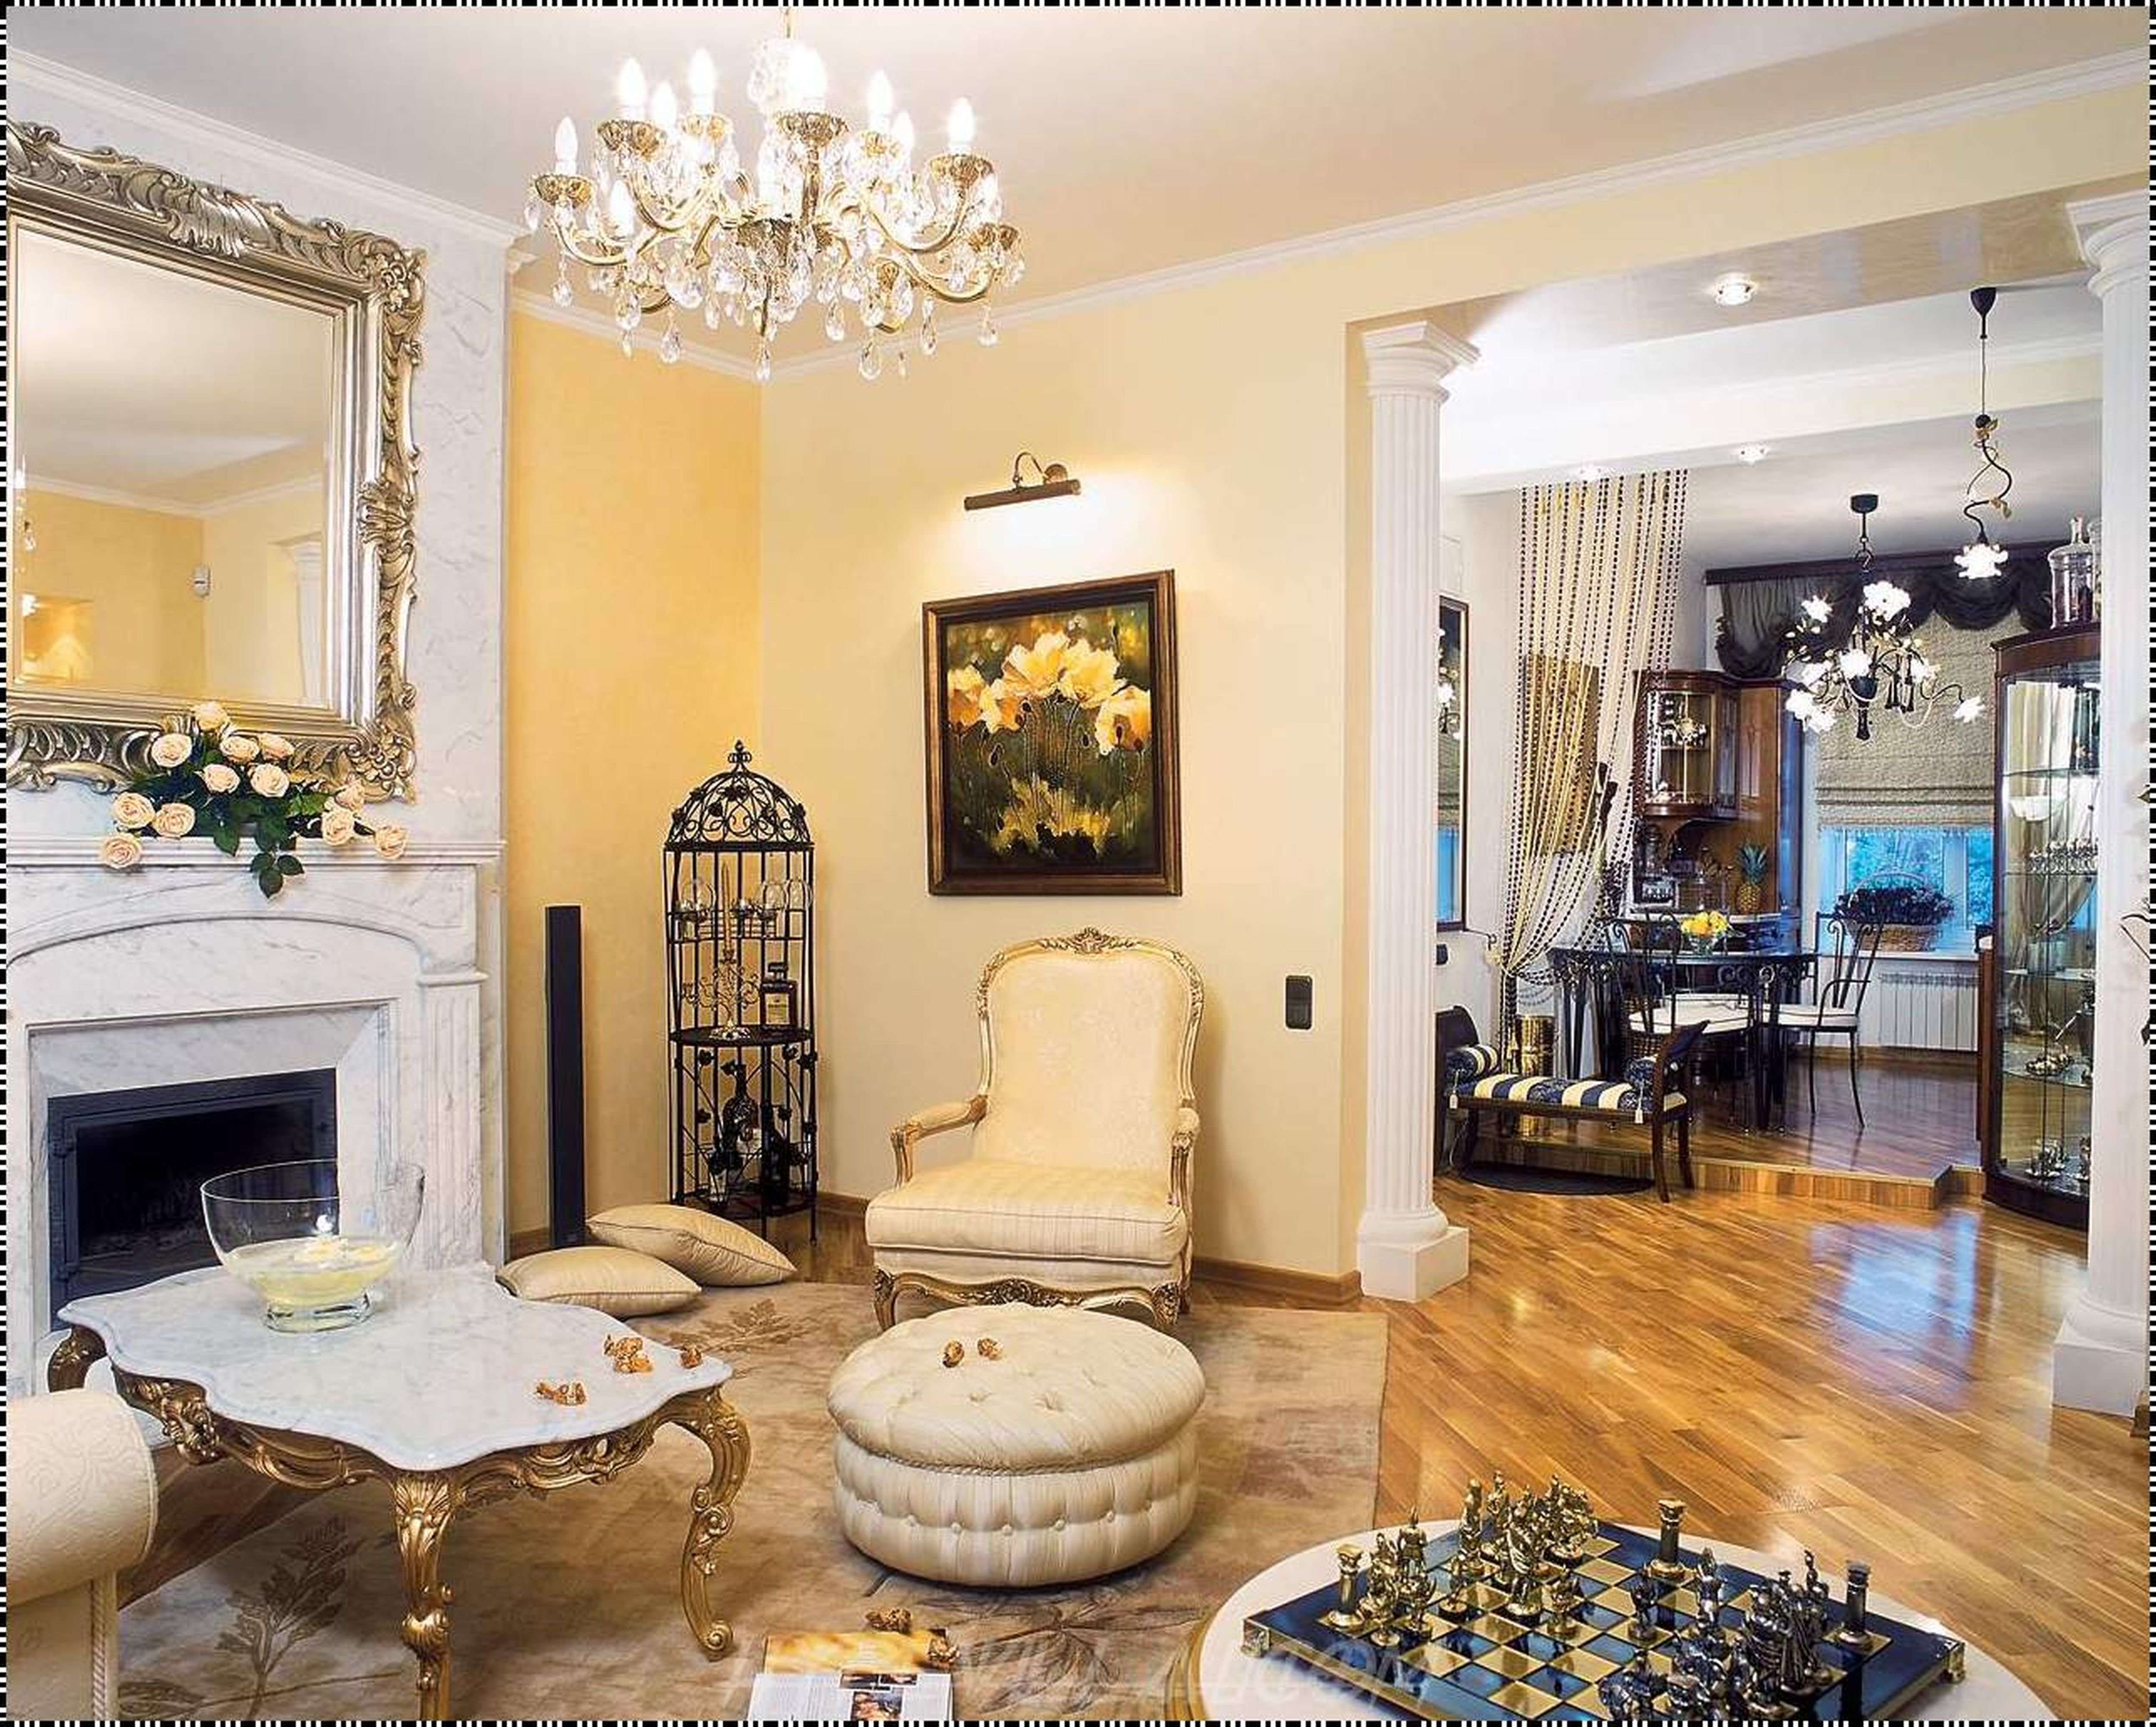 Interior design room house home apartment condo 70 for Interior design room grid